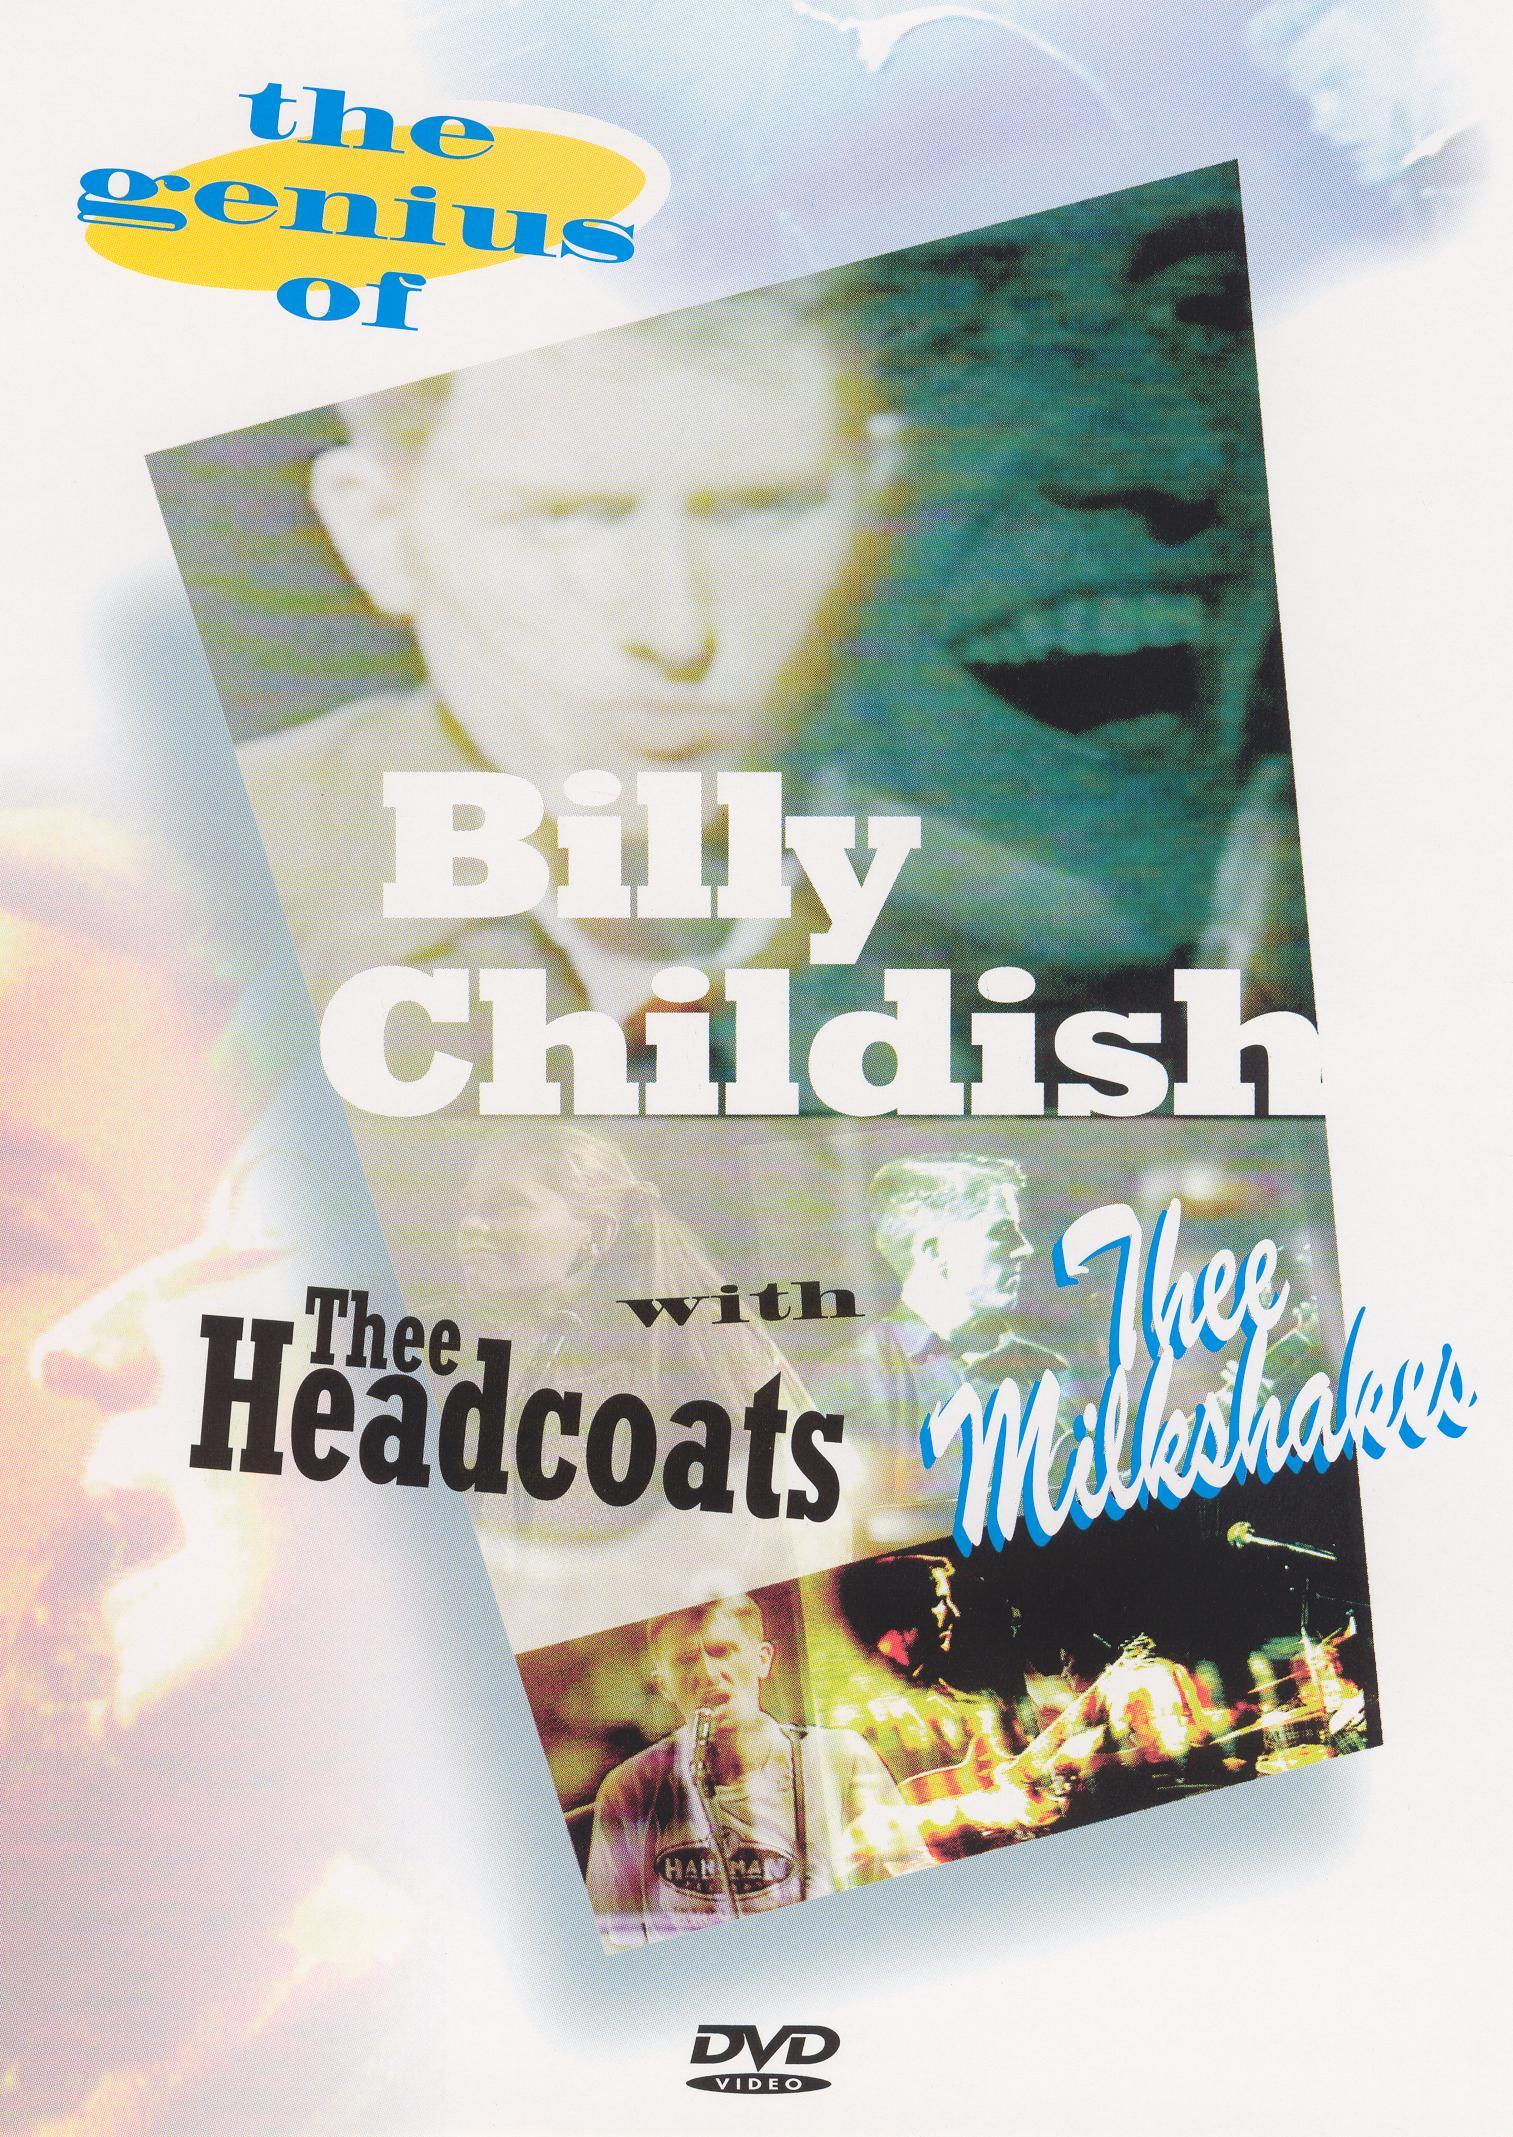 The Genius of Billy Childish